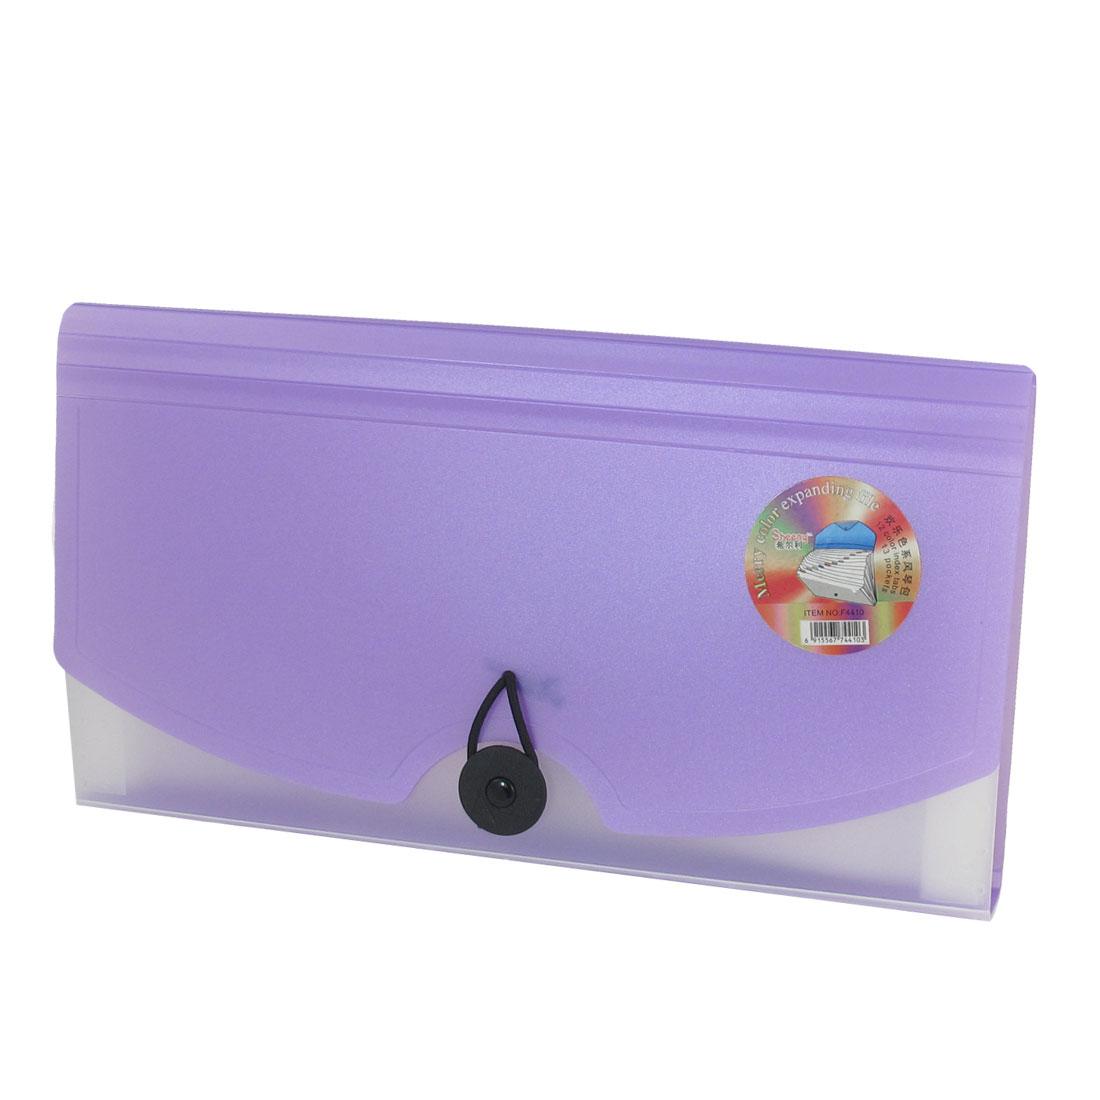 Portable Purple Plastic 13 Pockets Expanding File Holder Folder